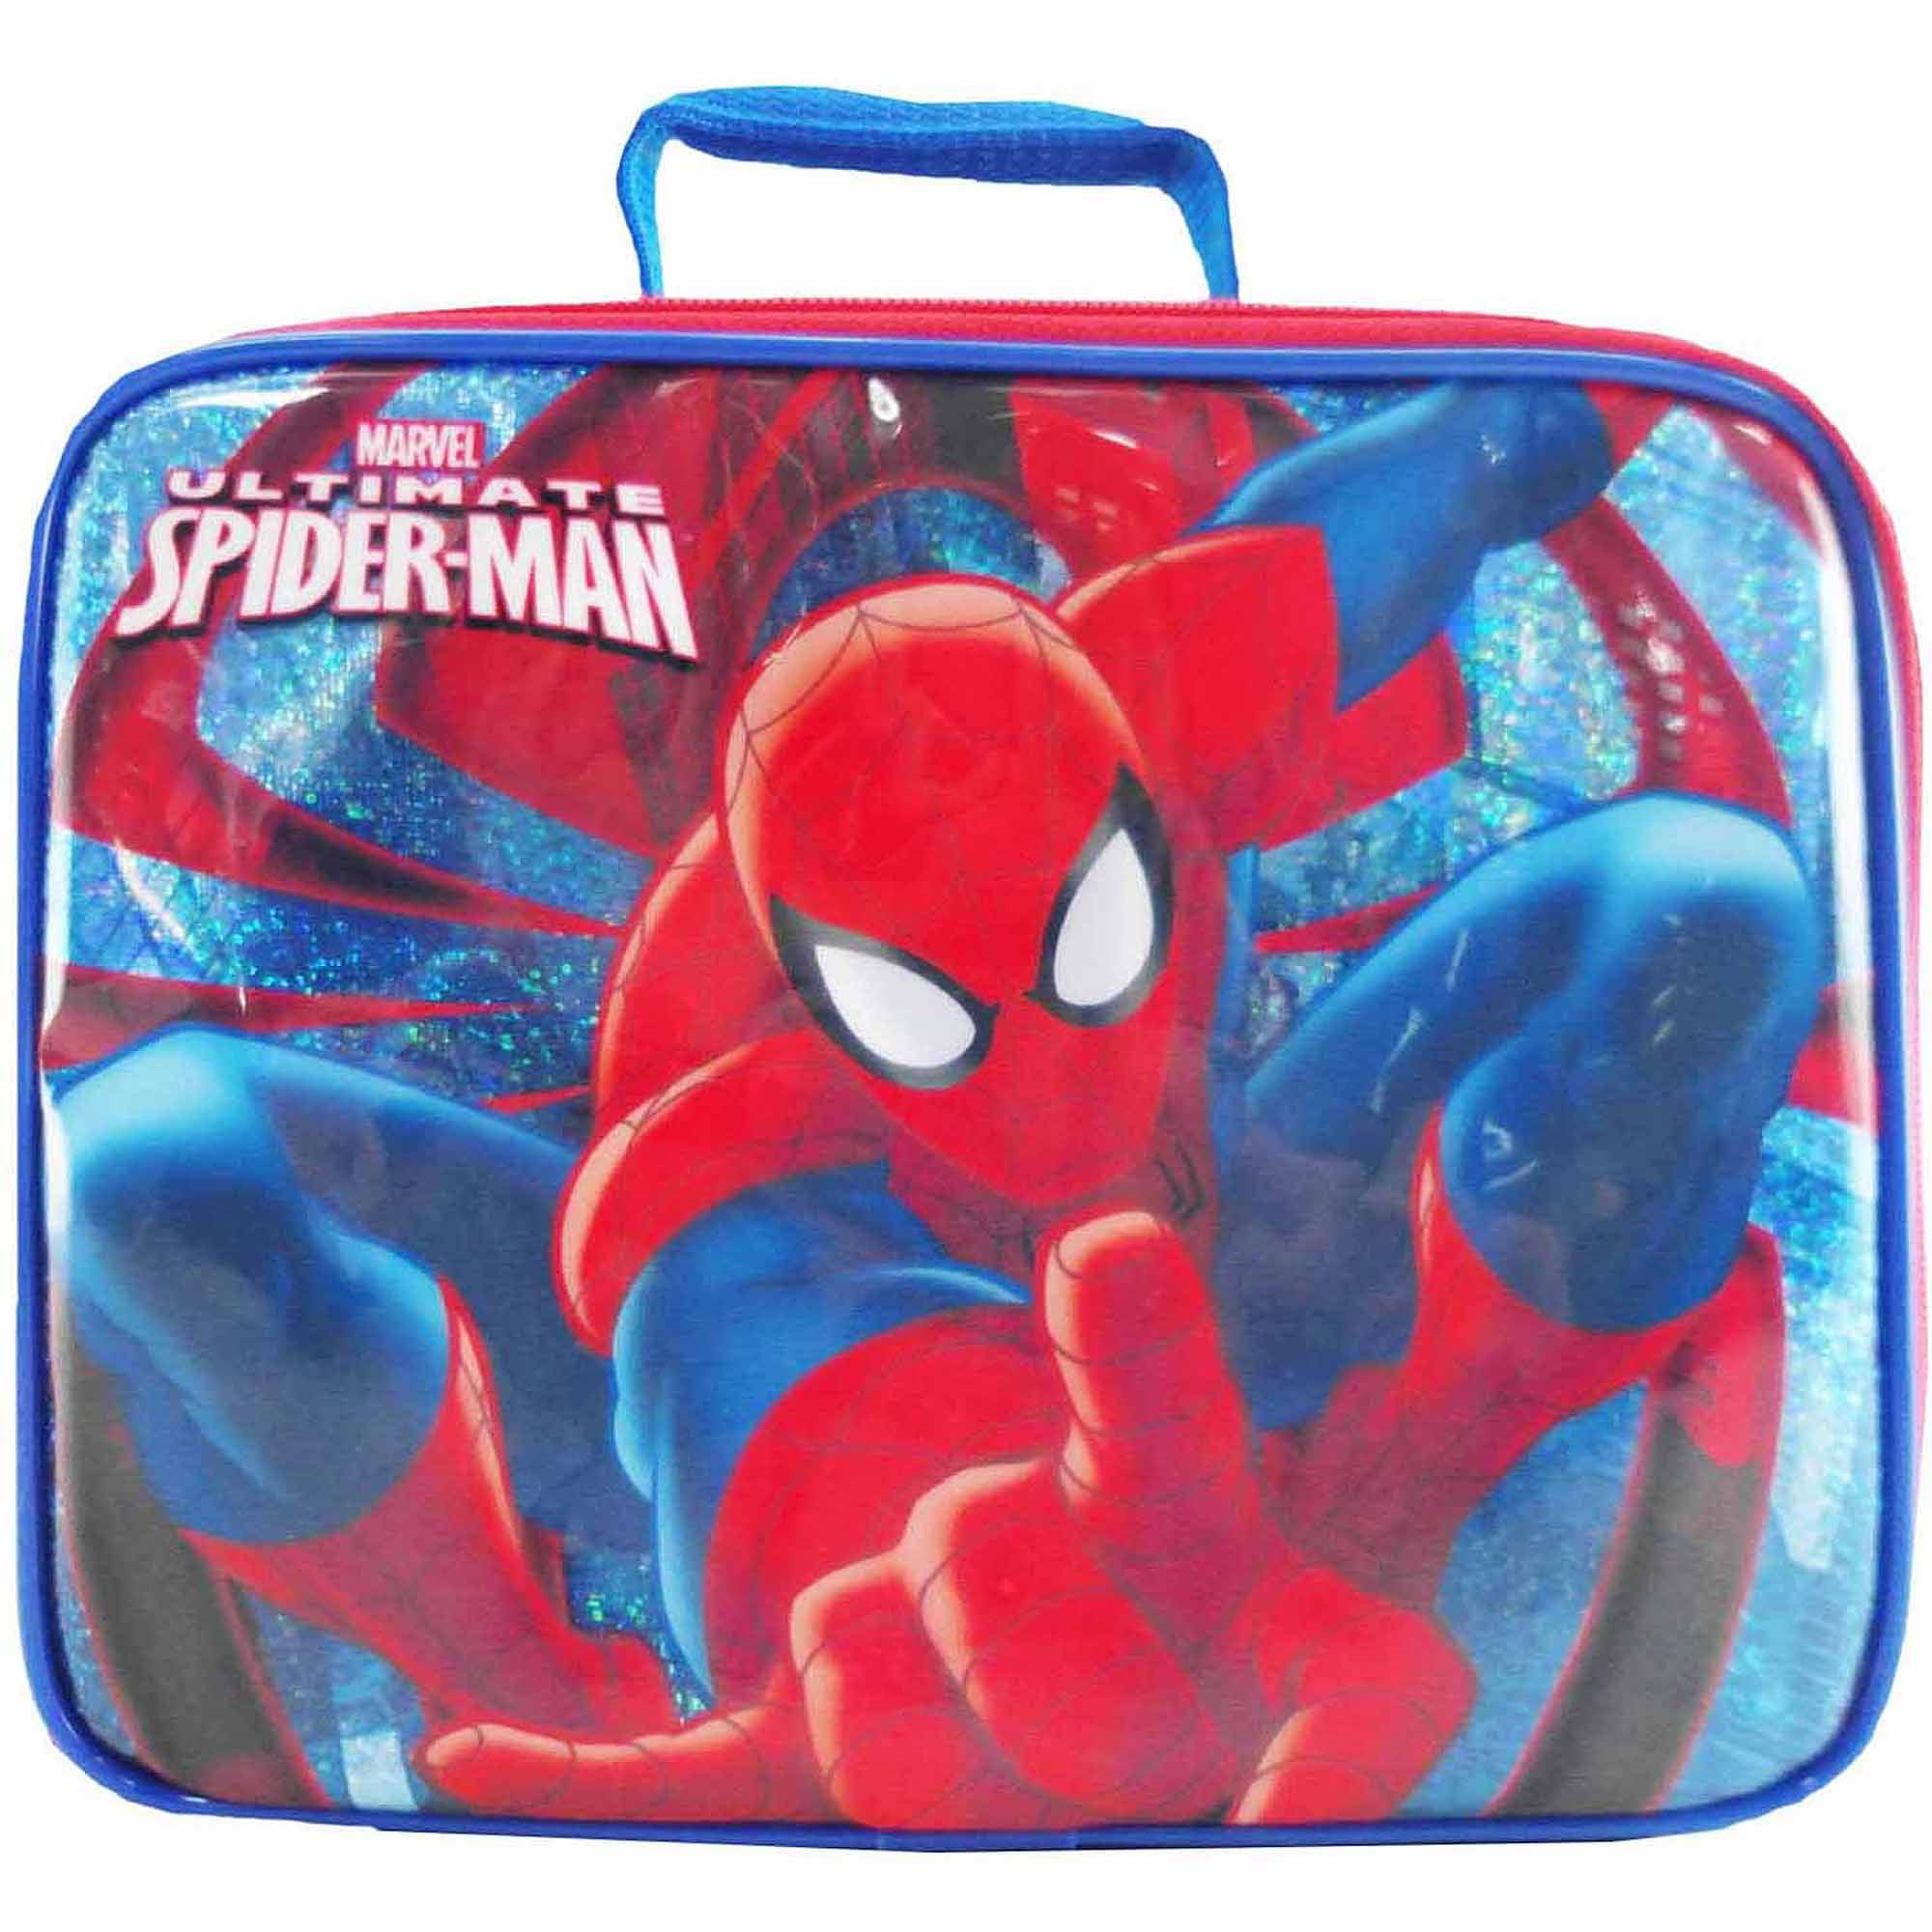 Lunch Bag - Marvel - Spiderman Jumping V2 Kit Case New US24221SCBL